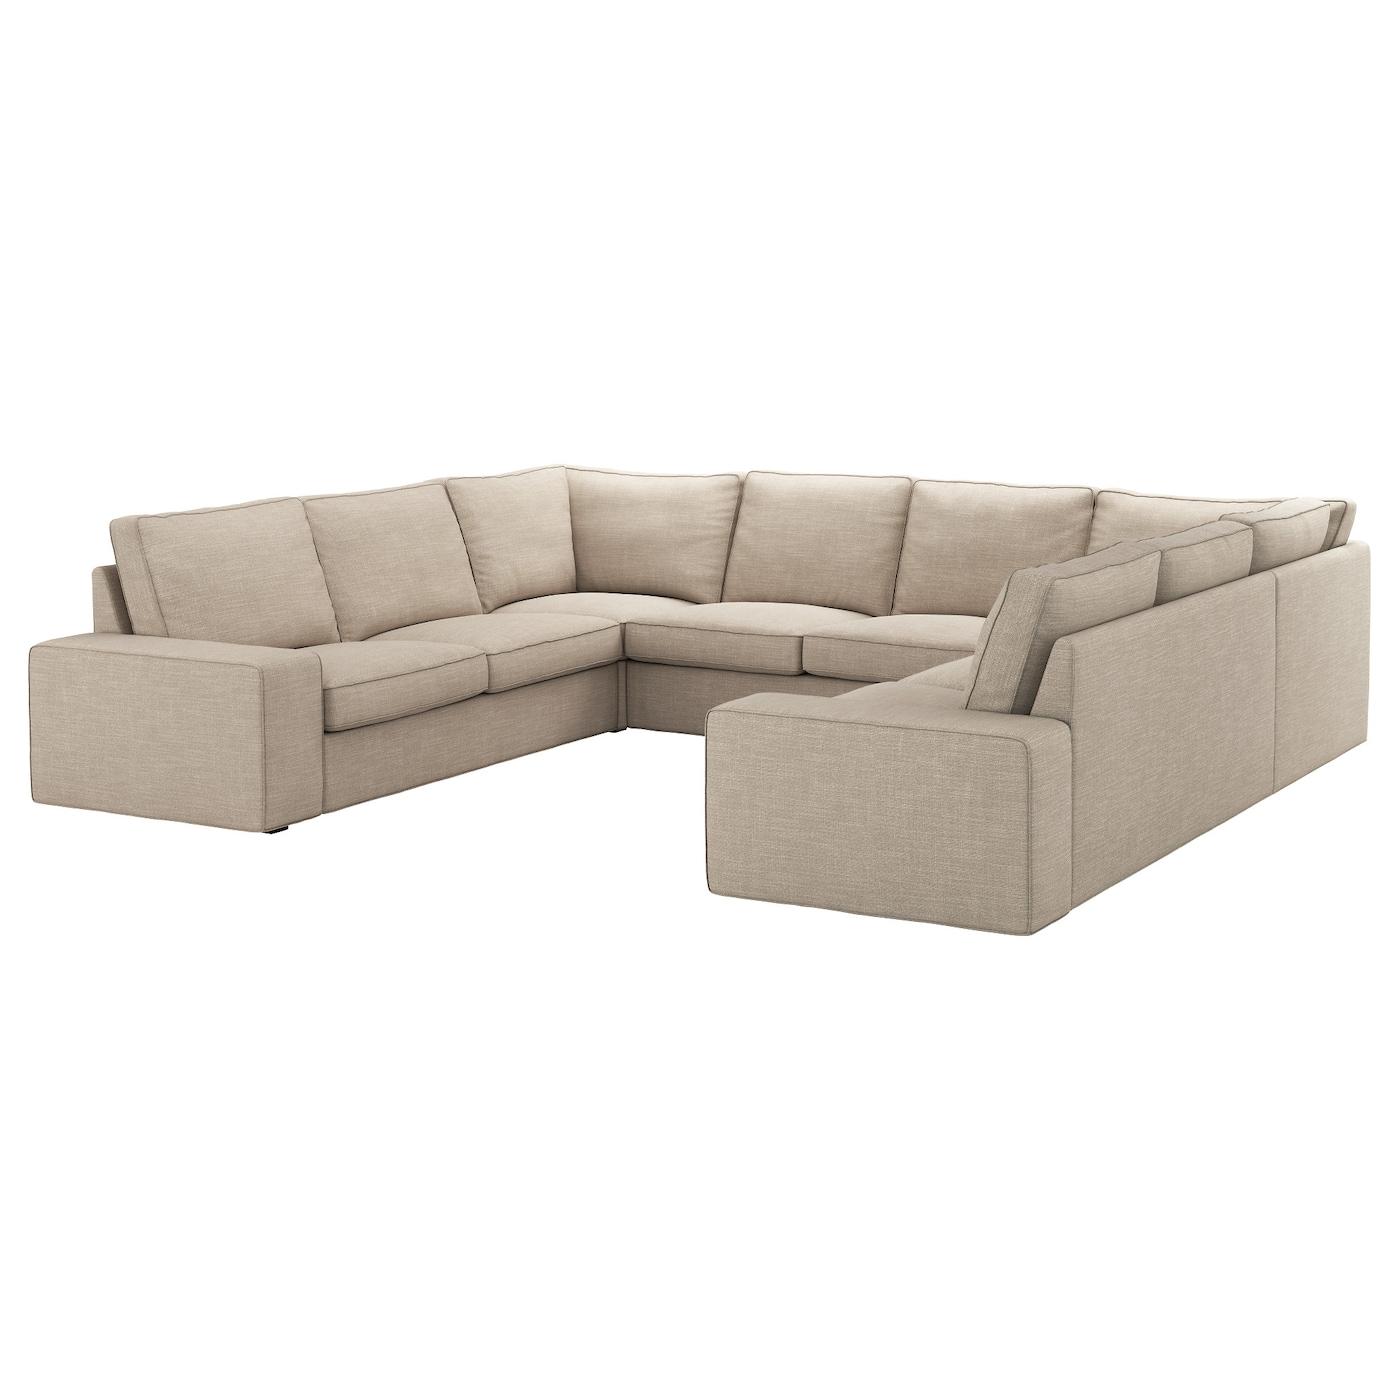 IKEA KIVIK U-shaped Sofa, 6 Seat 10 Year Guarantee. Read About The